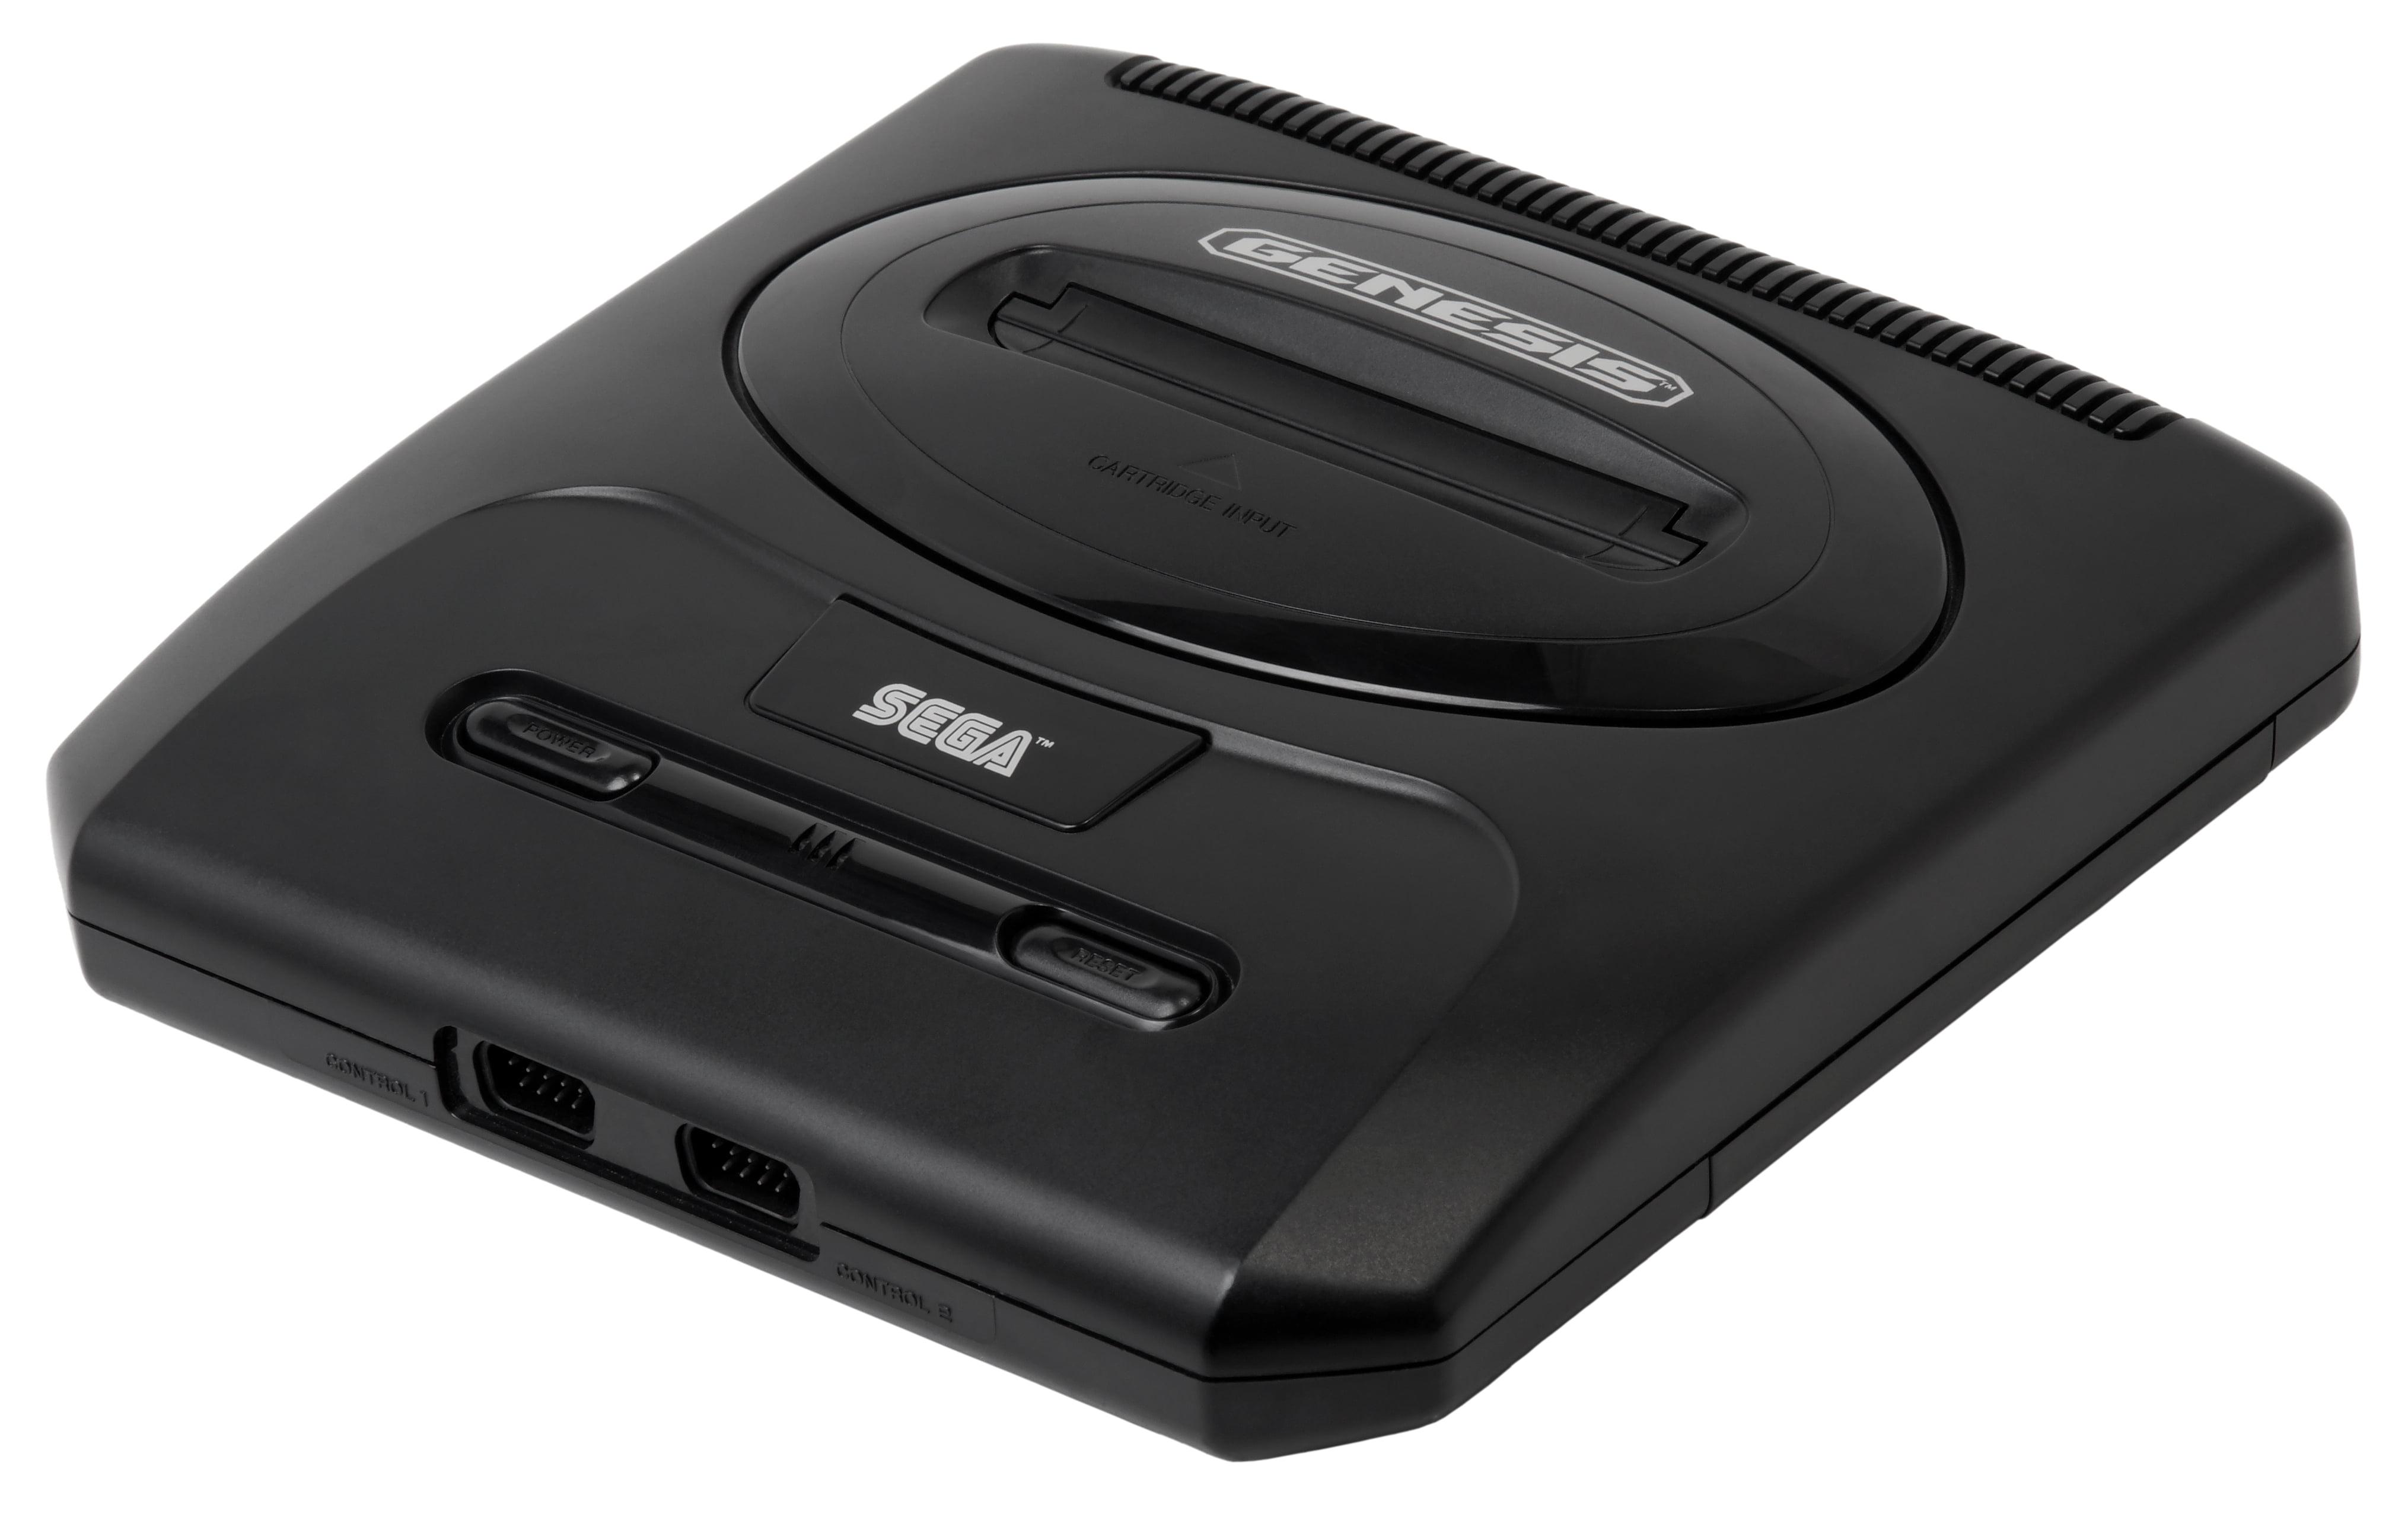 Refurbished Sega Genesis Core System 2 Video Game Console by Sega